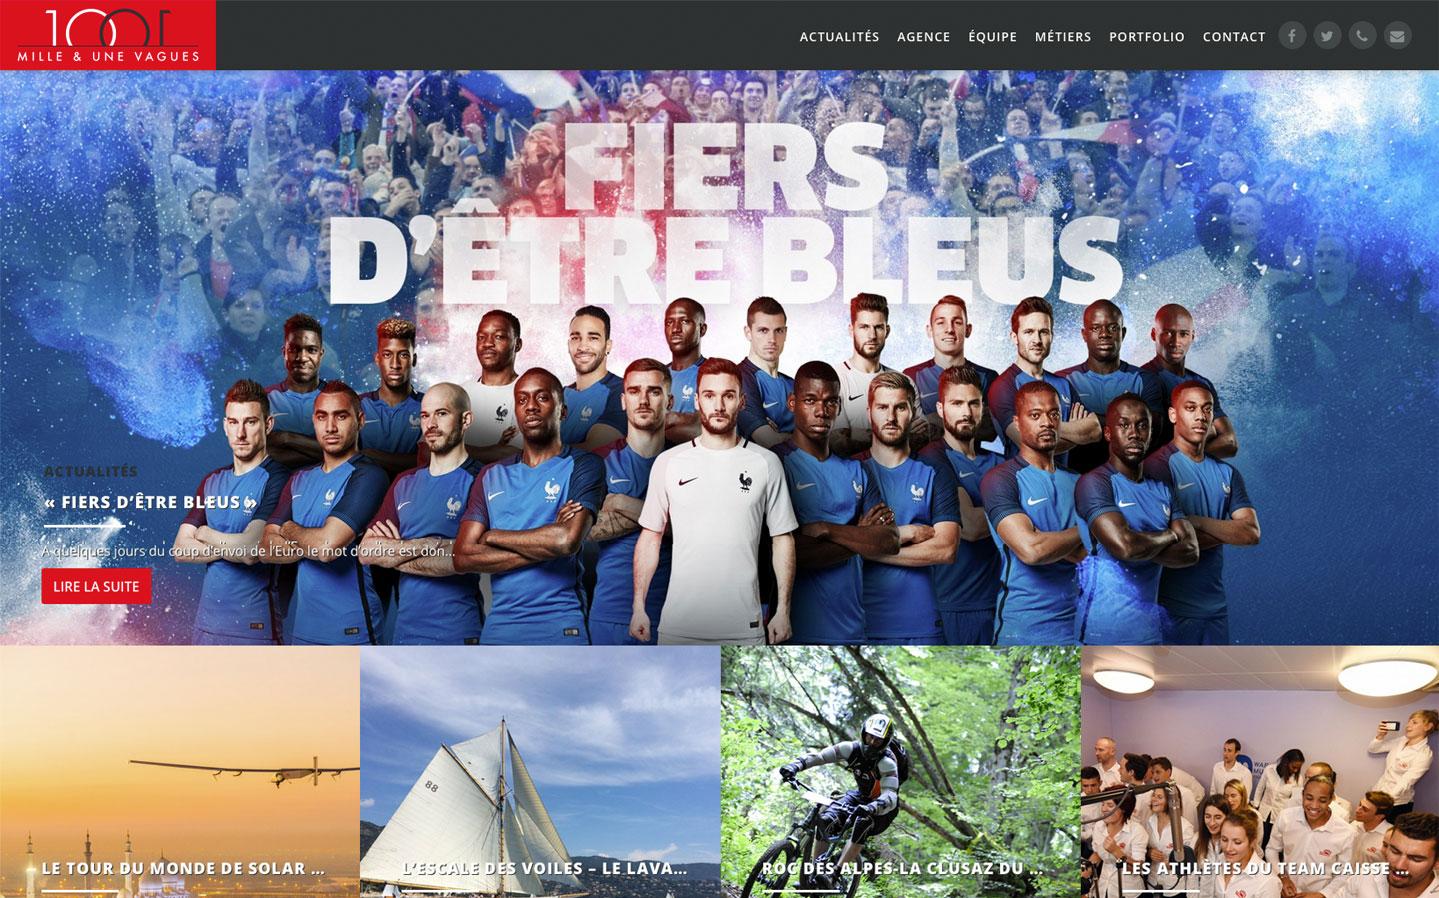 milletunevagues.com flat icon